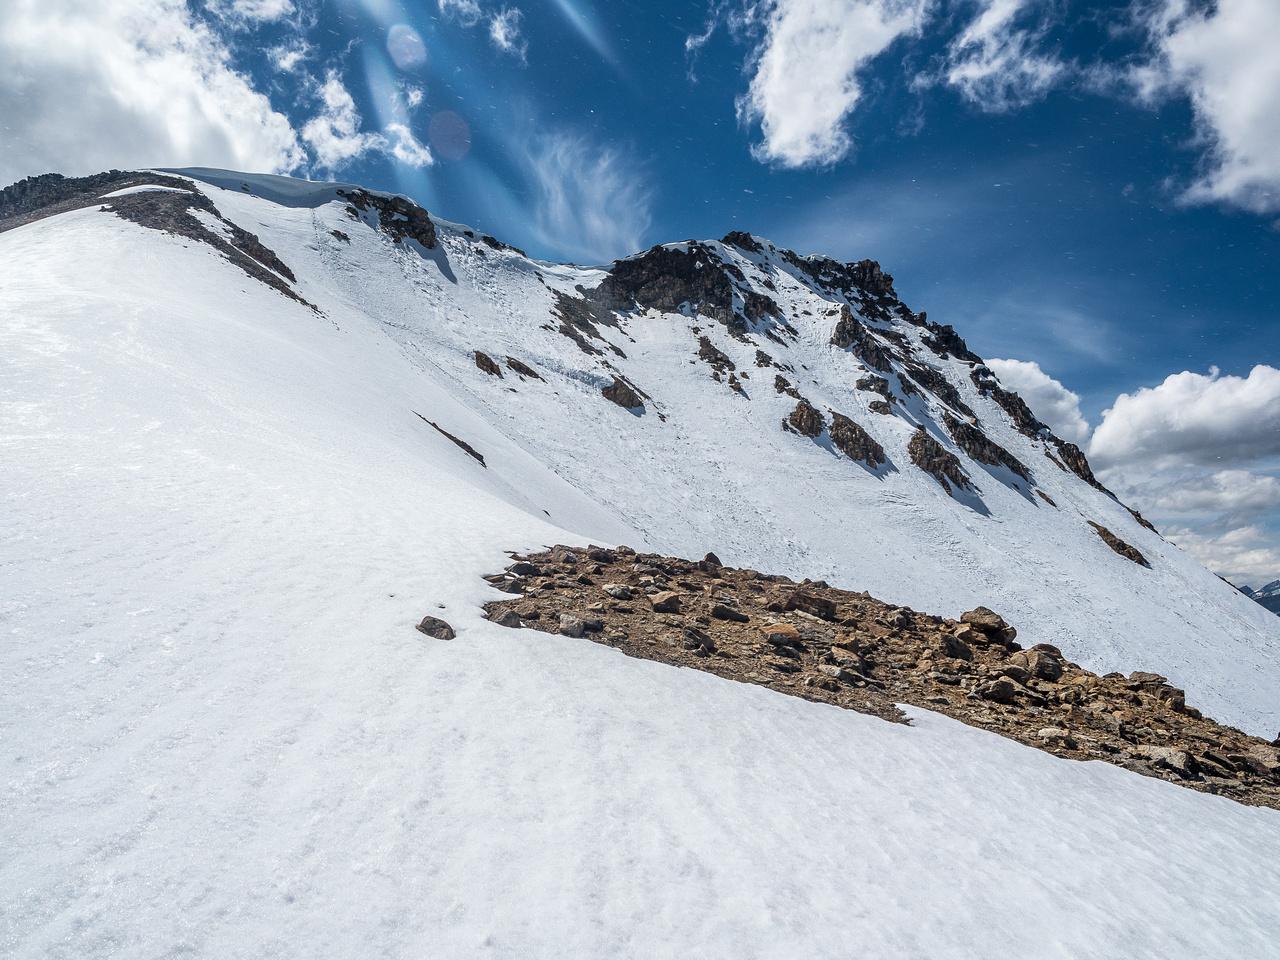 Looking along the snowy NE face of Landslide Peak.